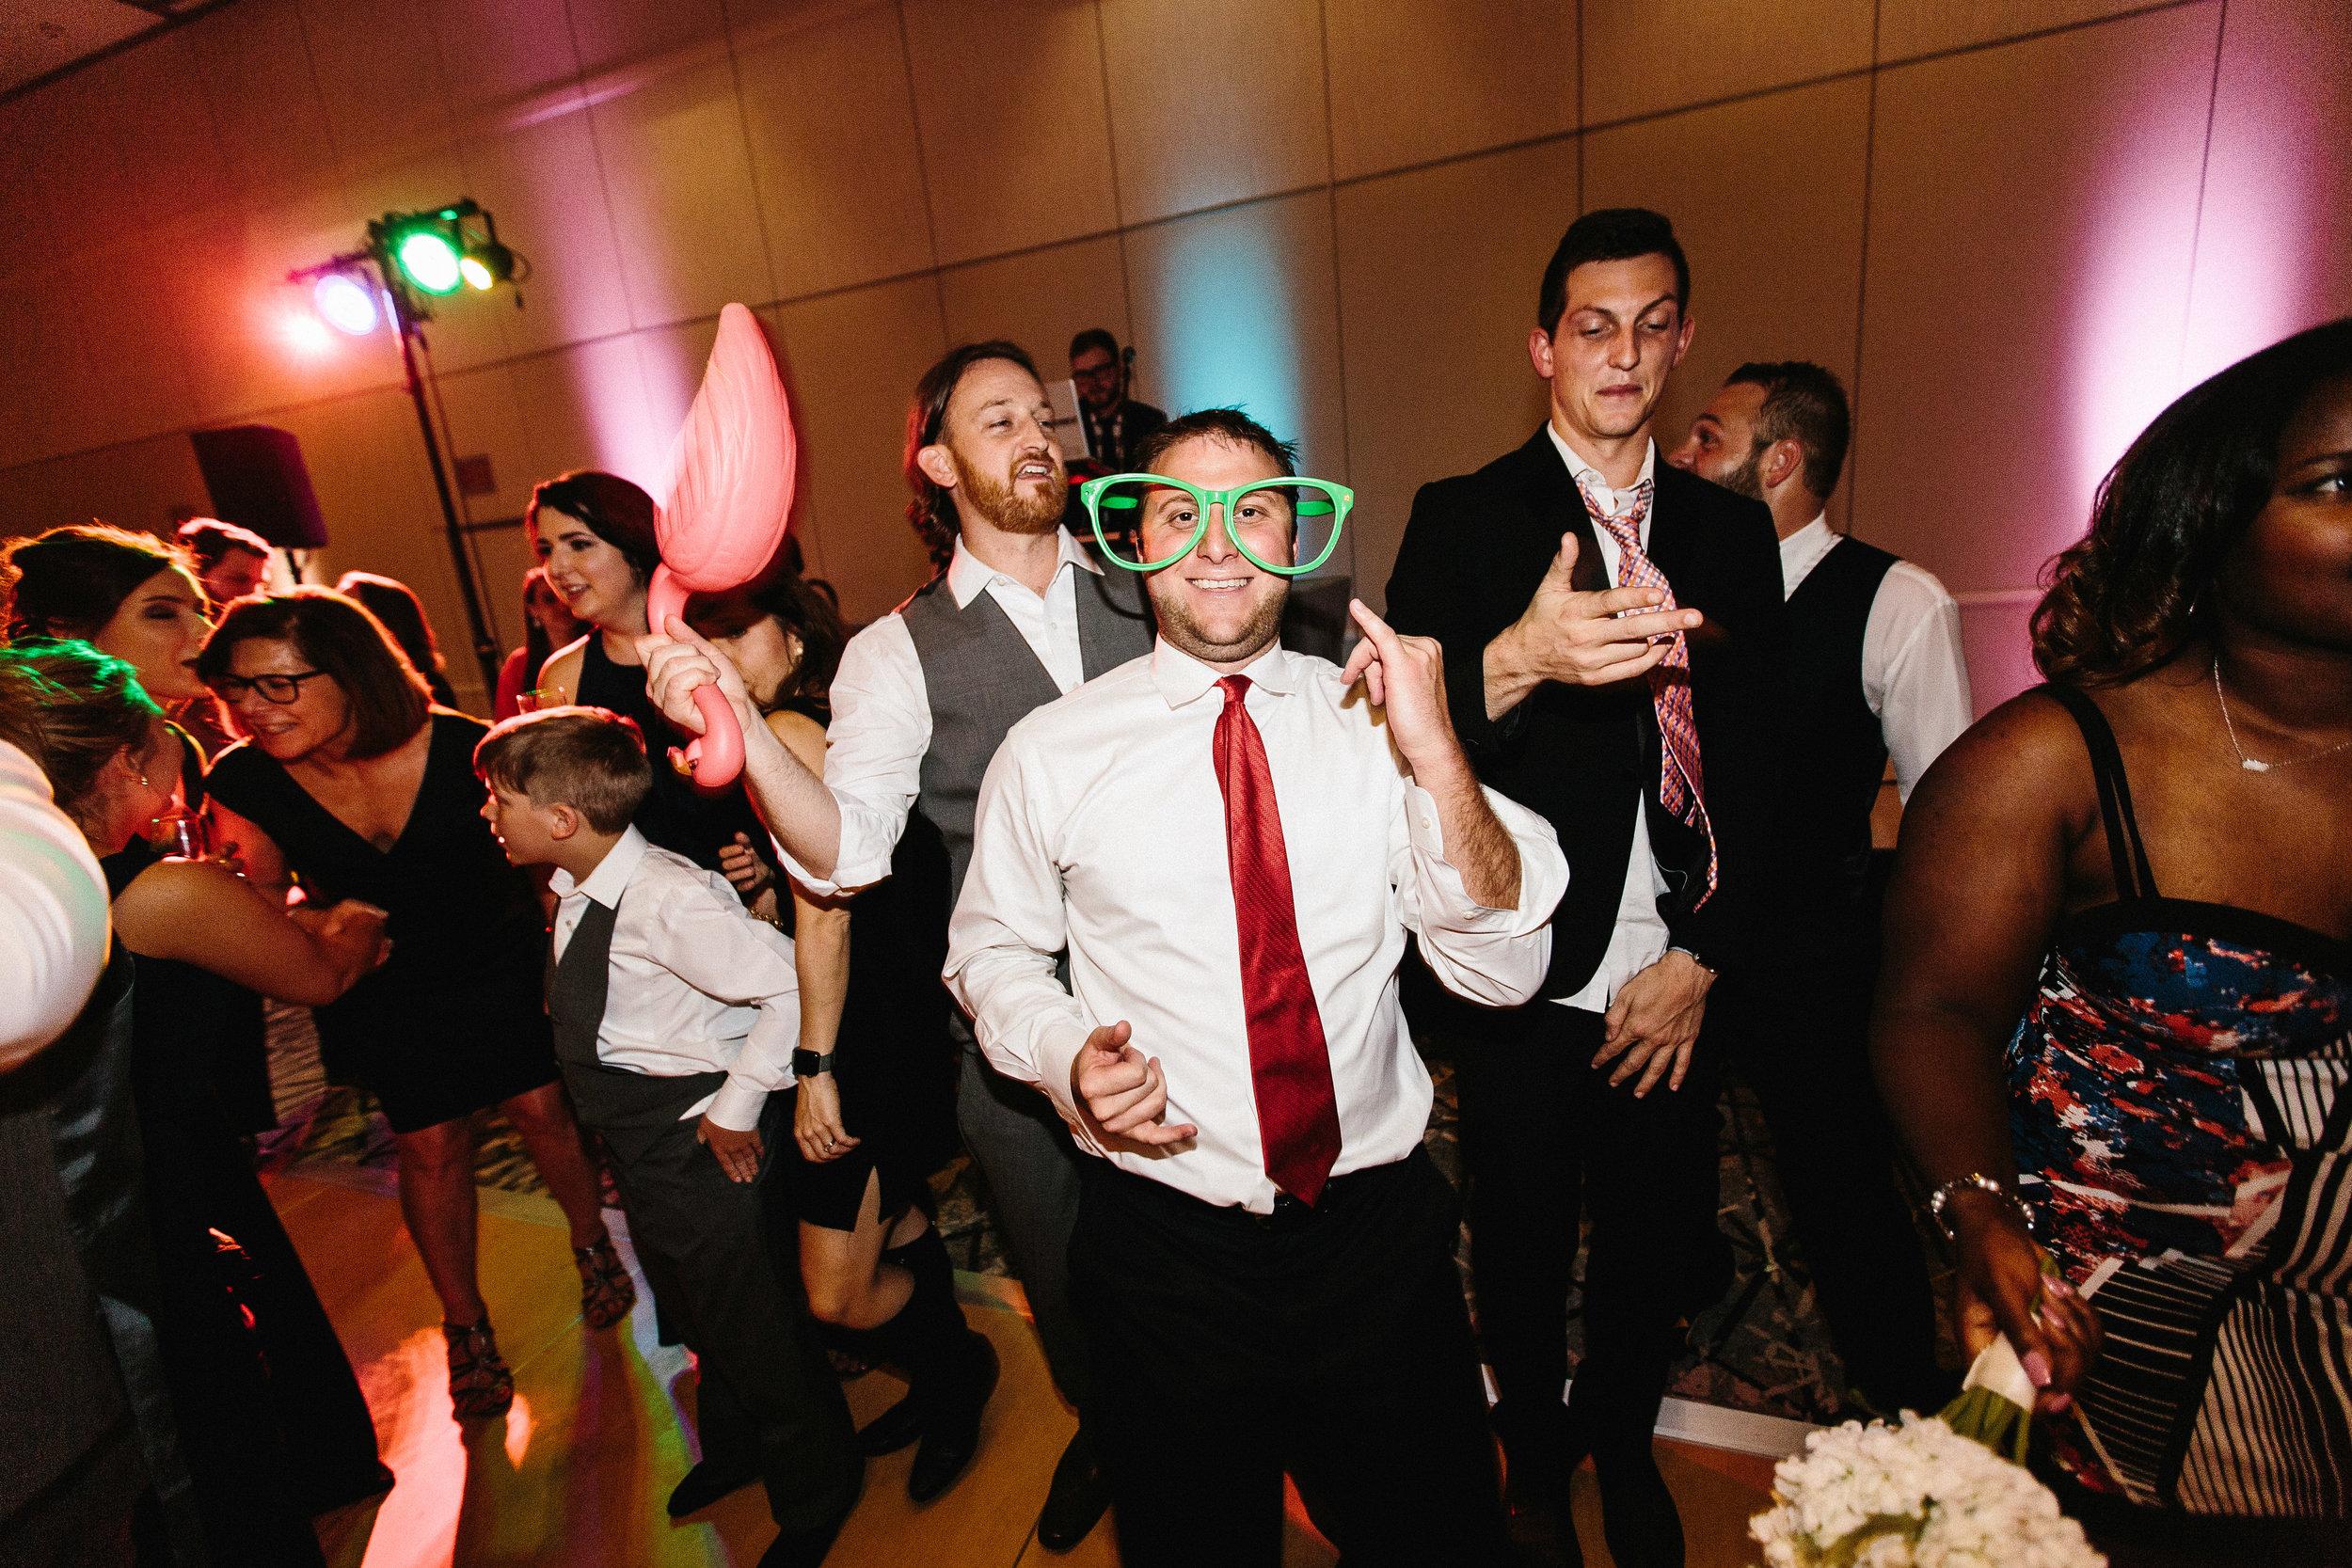 roswell_st_peter_chanel_catholic_avalon_hotel_alpharetta_wedding-2311.jpg